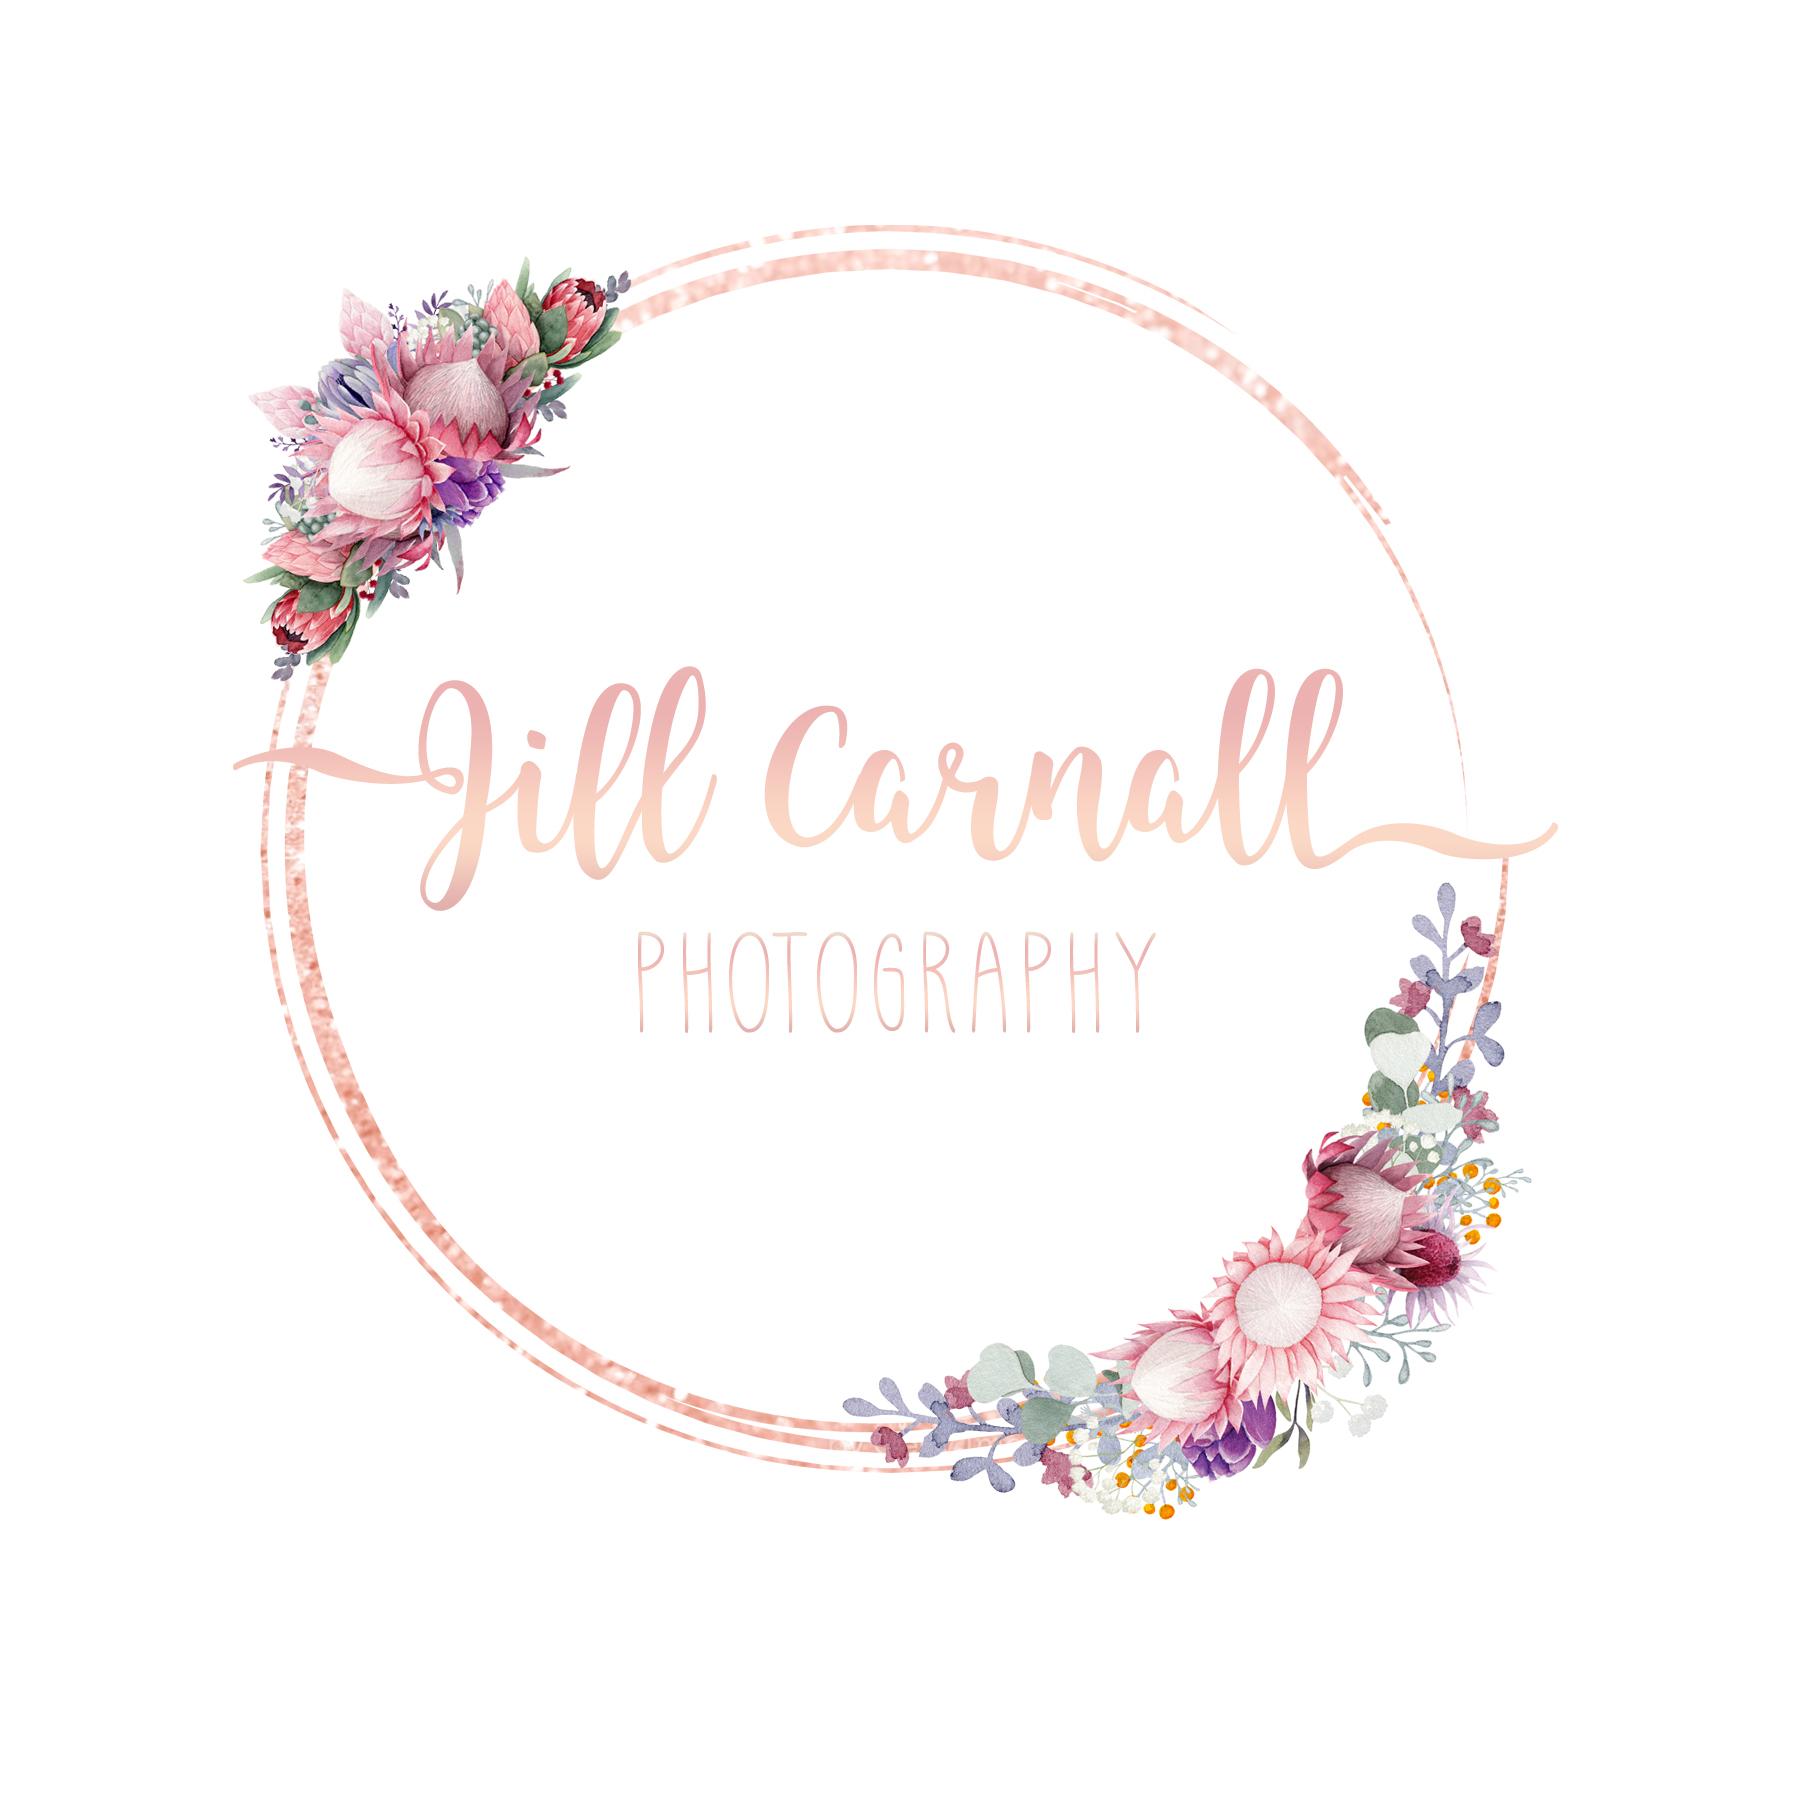 jill carnall logo 2 copy